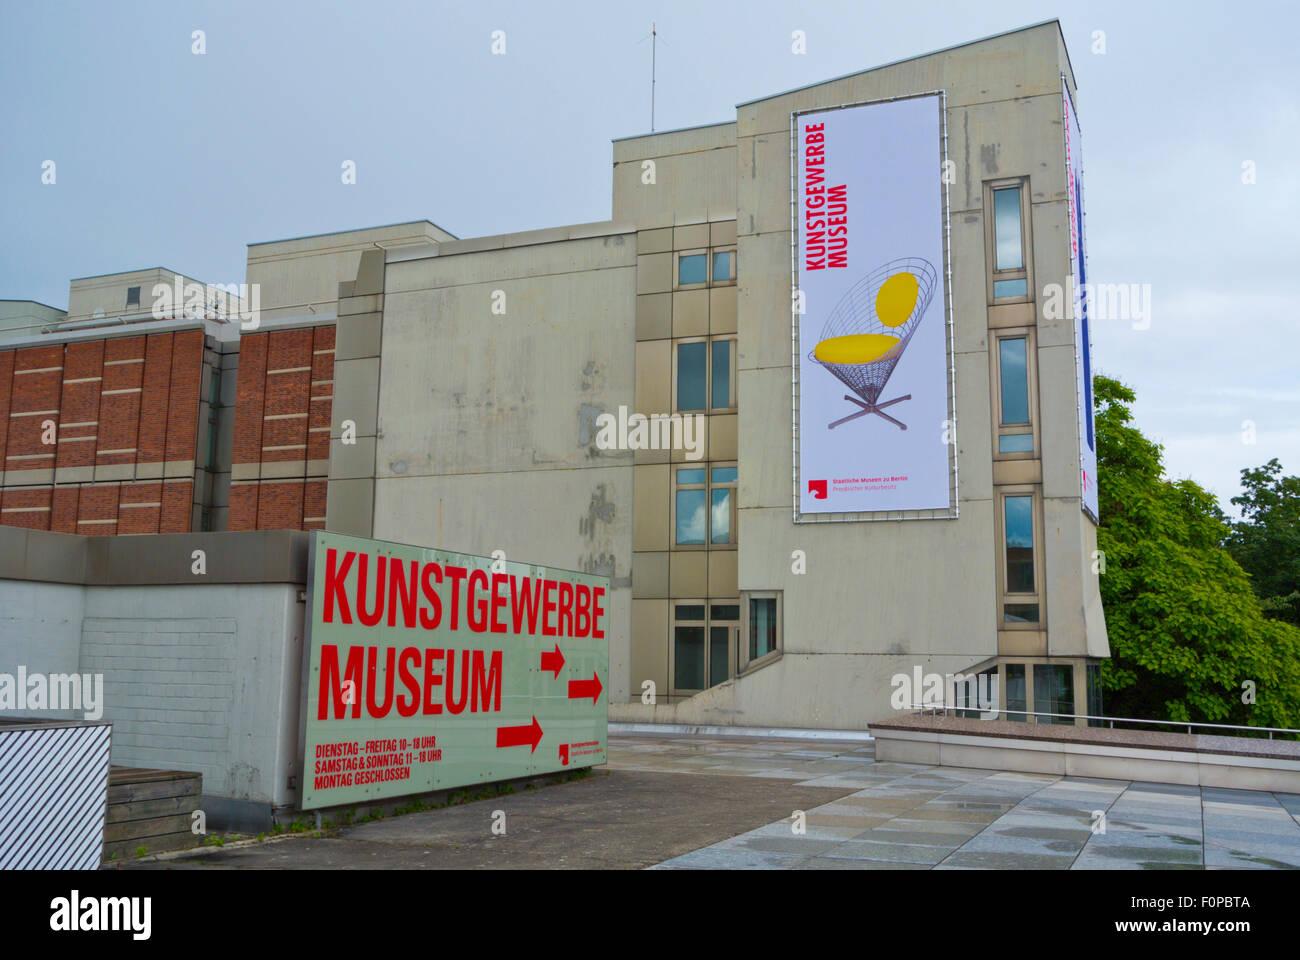 Kunstgewerbemuseum, Museo di Arti Decorative, Matthäikirchplatz, nel quartiere Mitte di Berlino, Germania Immagini Stock